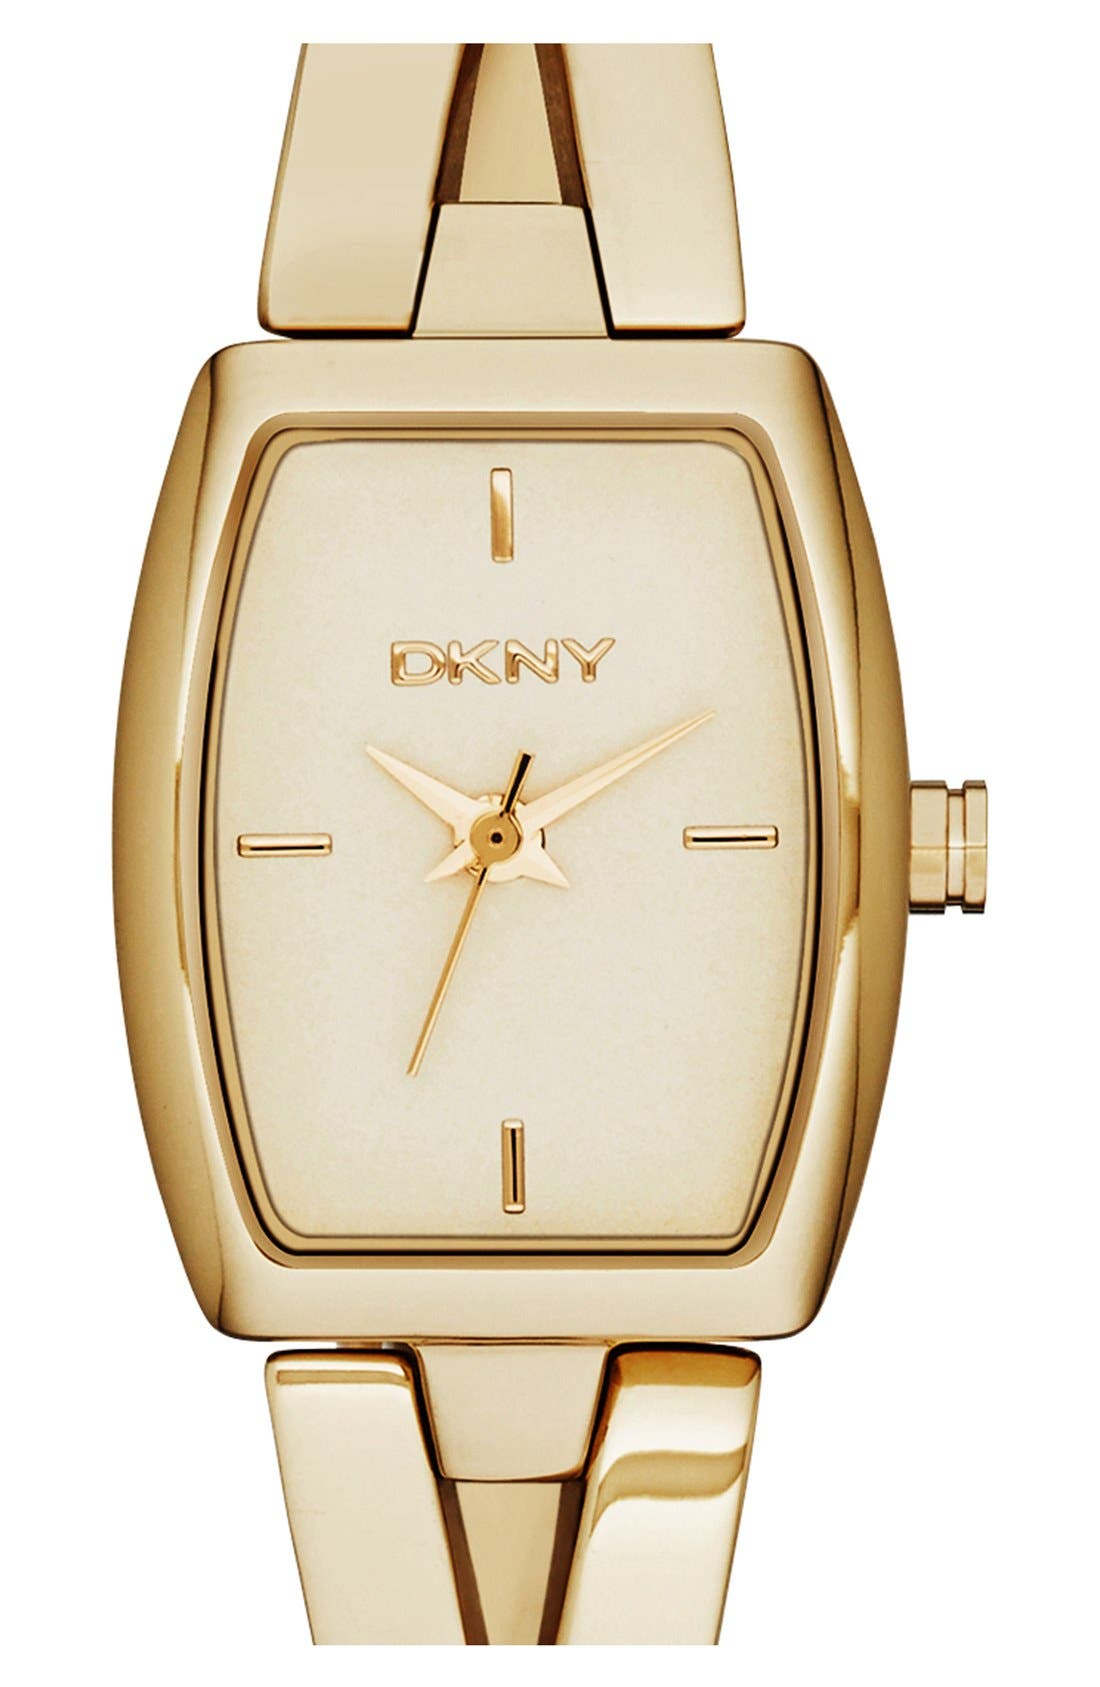 Main Image - DKNY 'Crosswalk' Bangle Watch, 18mm x 22mm